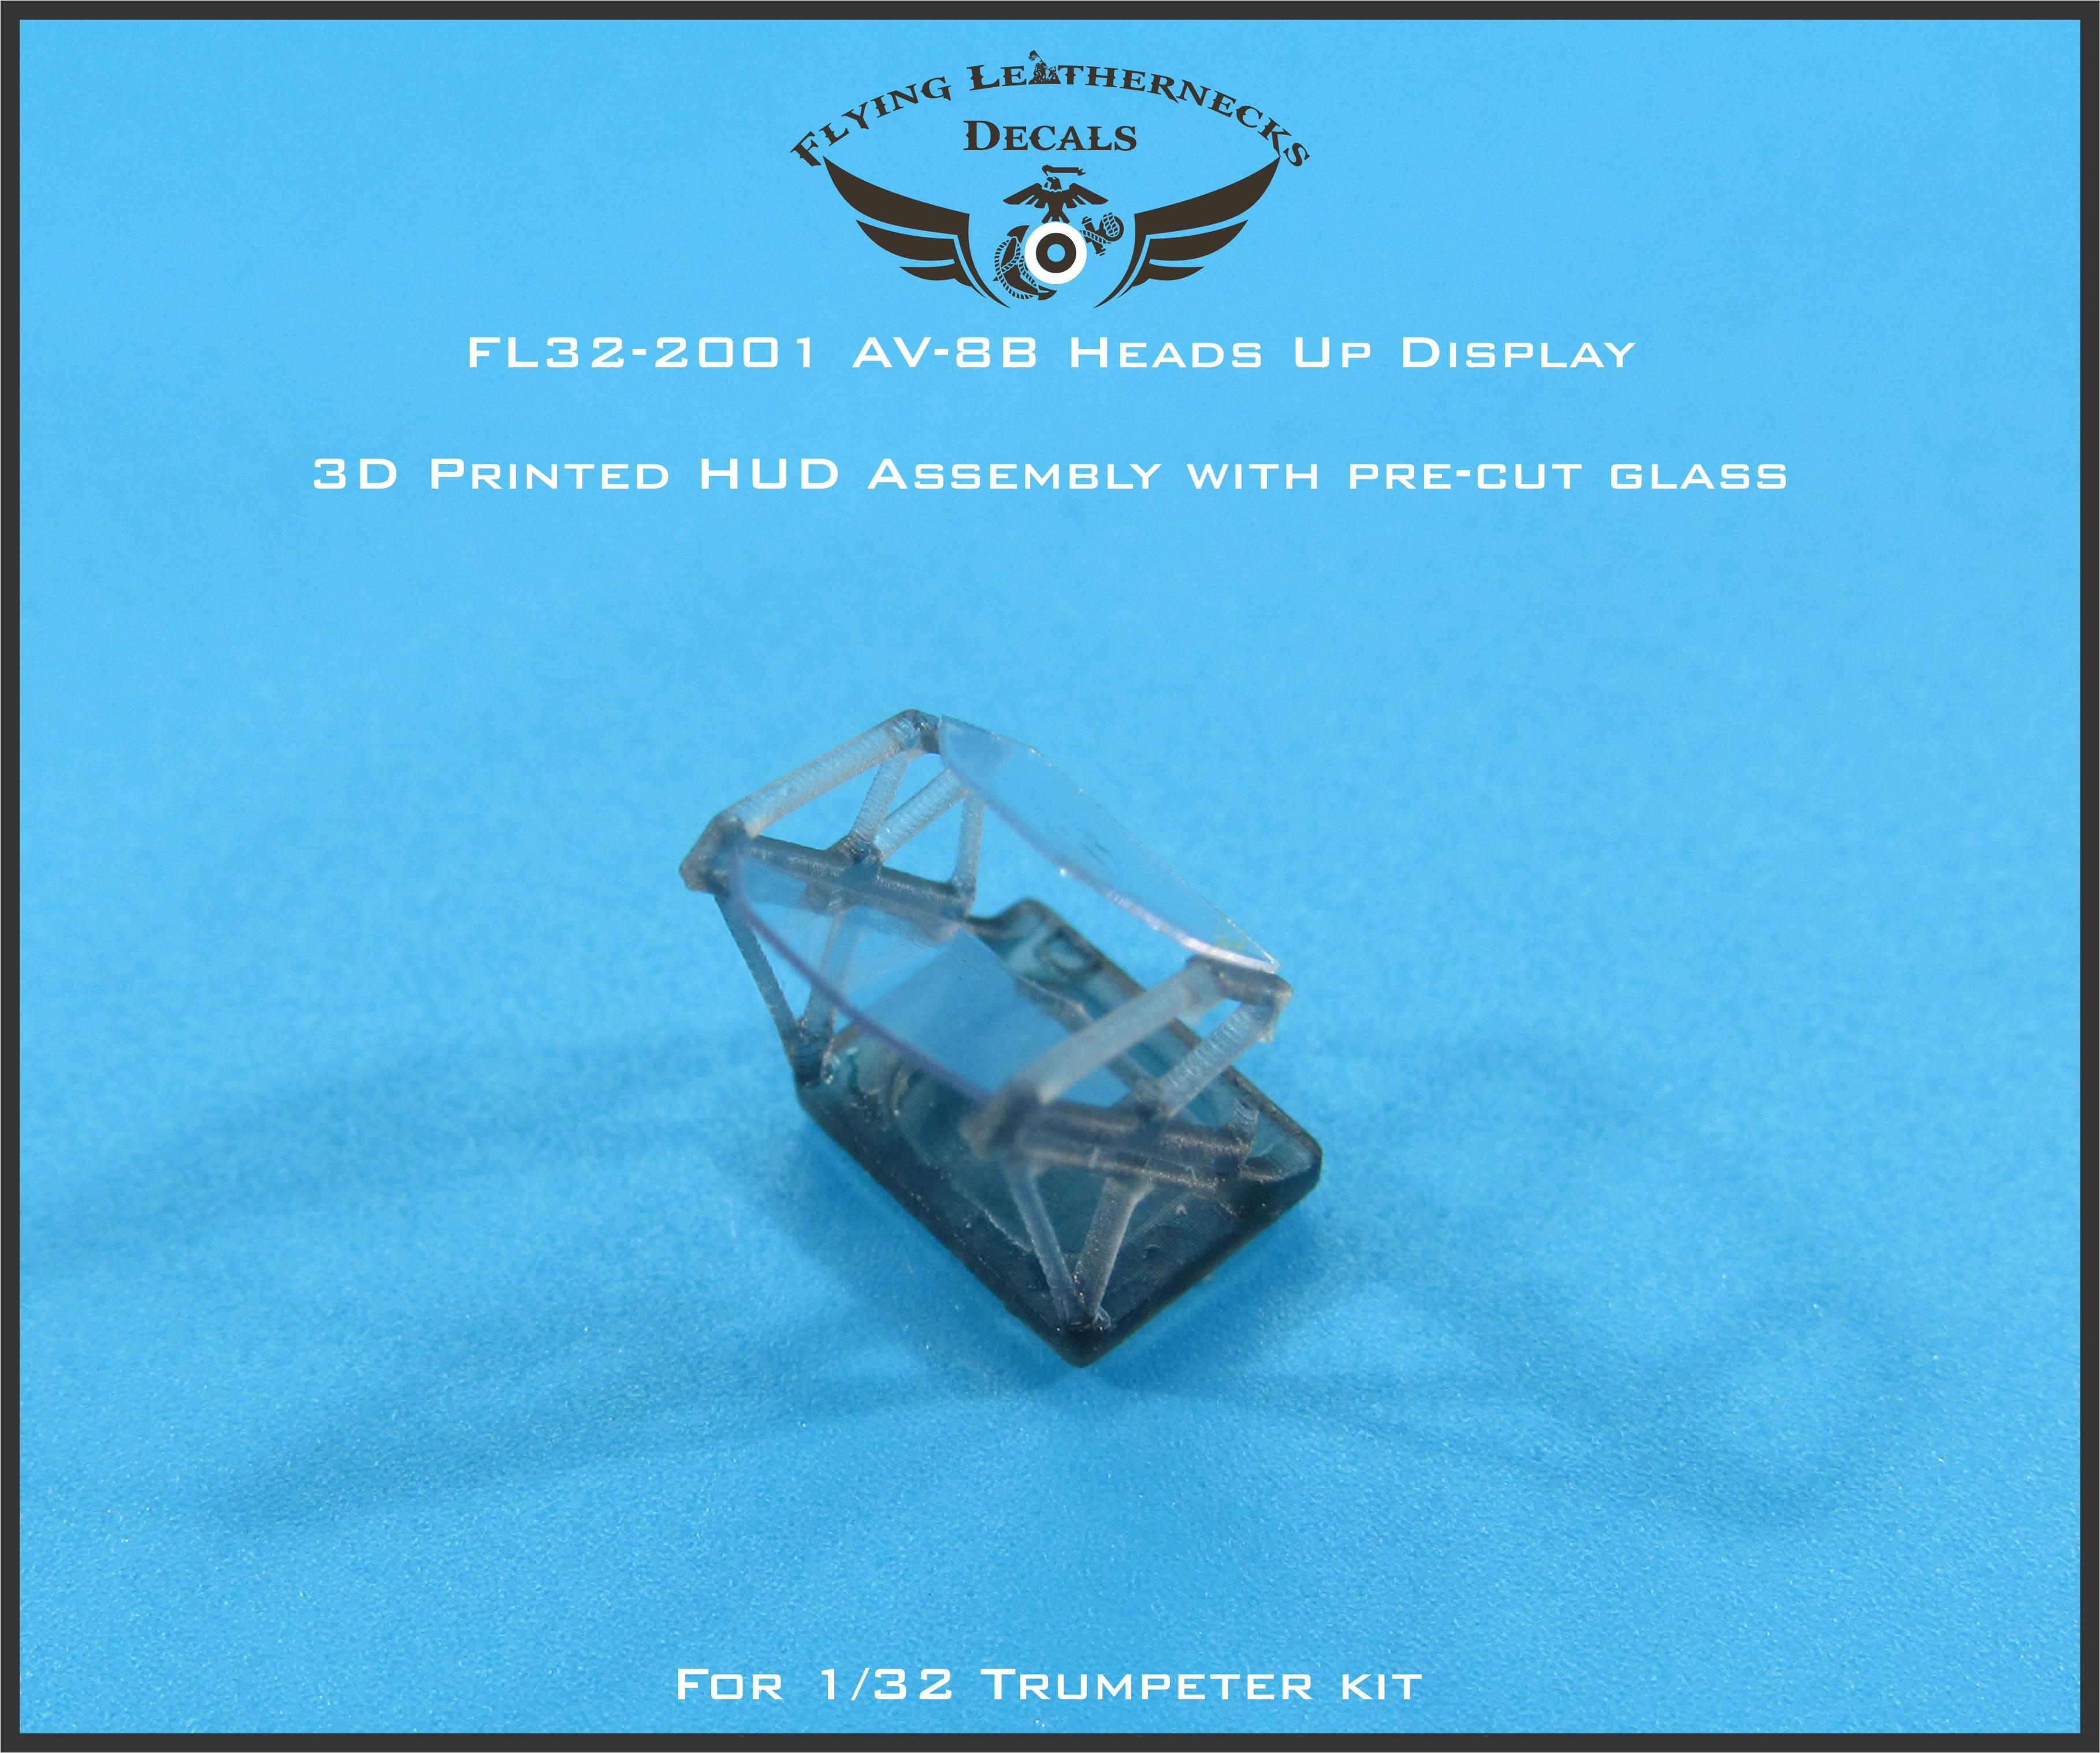 FL32-2001